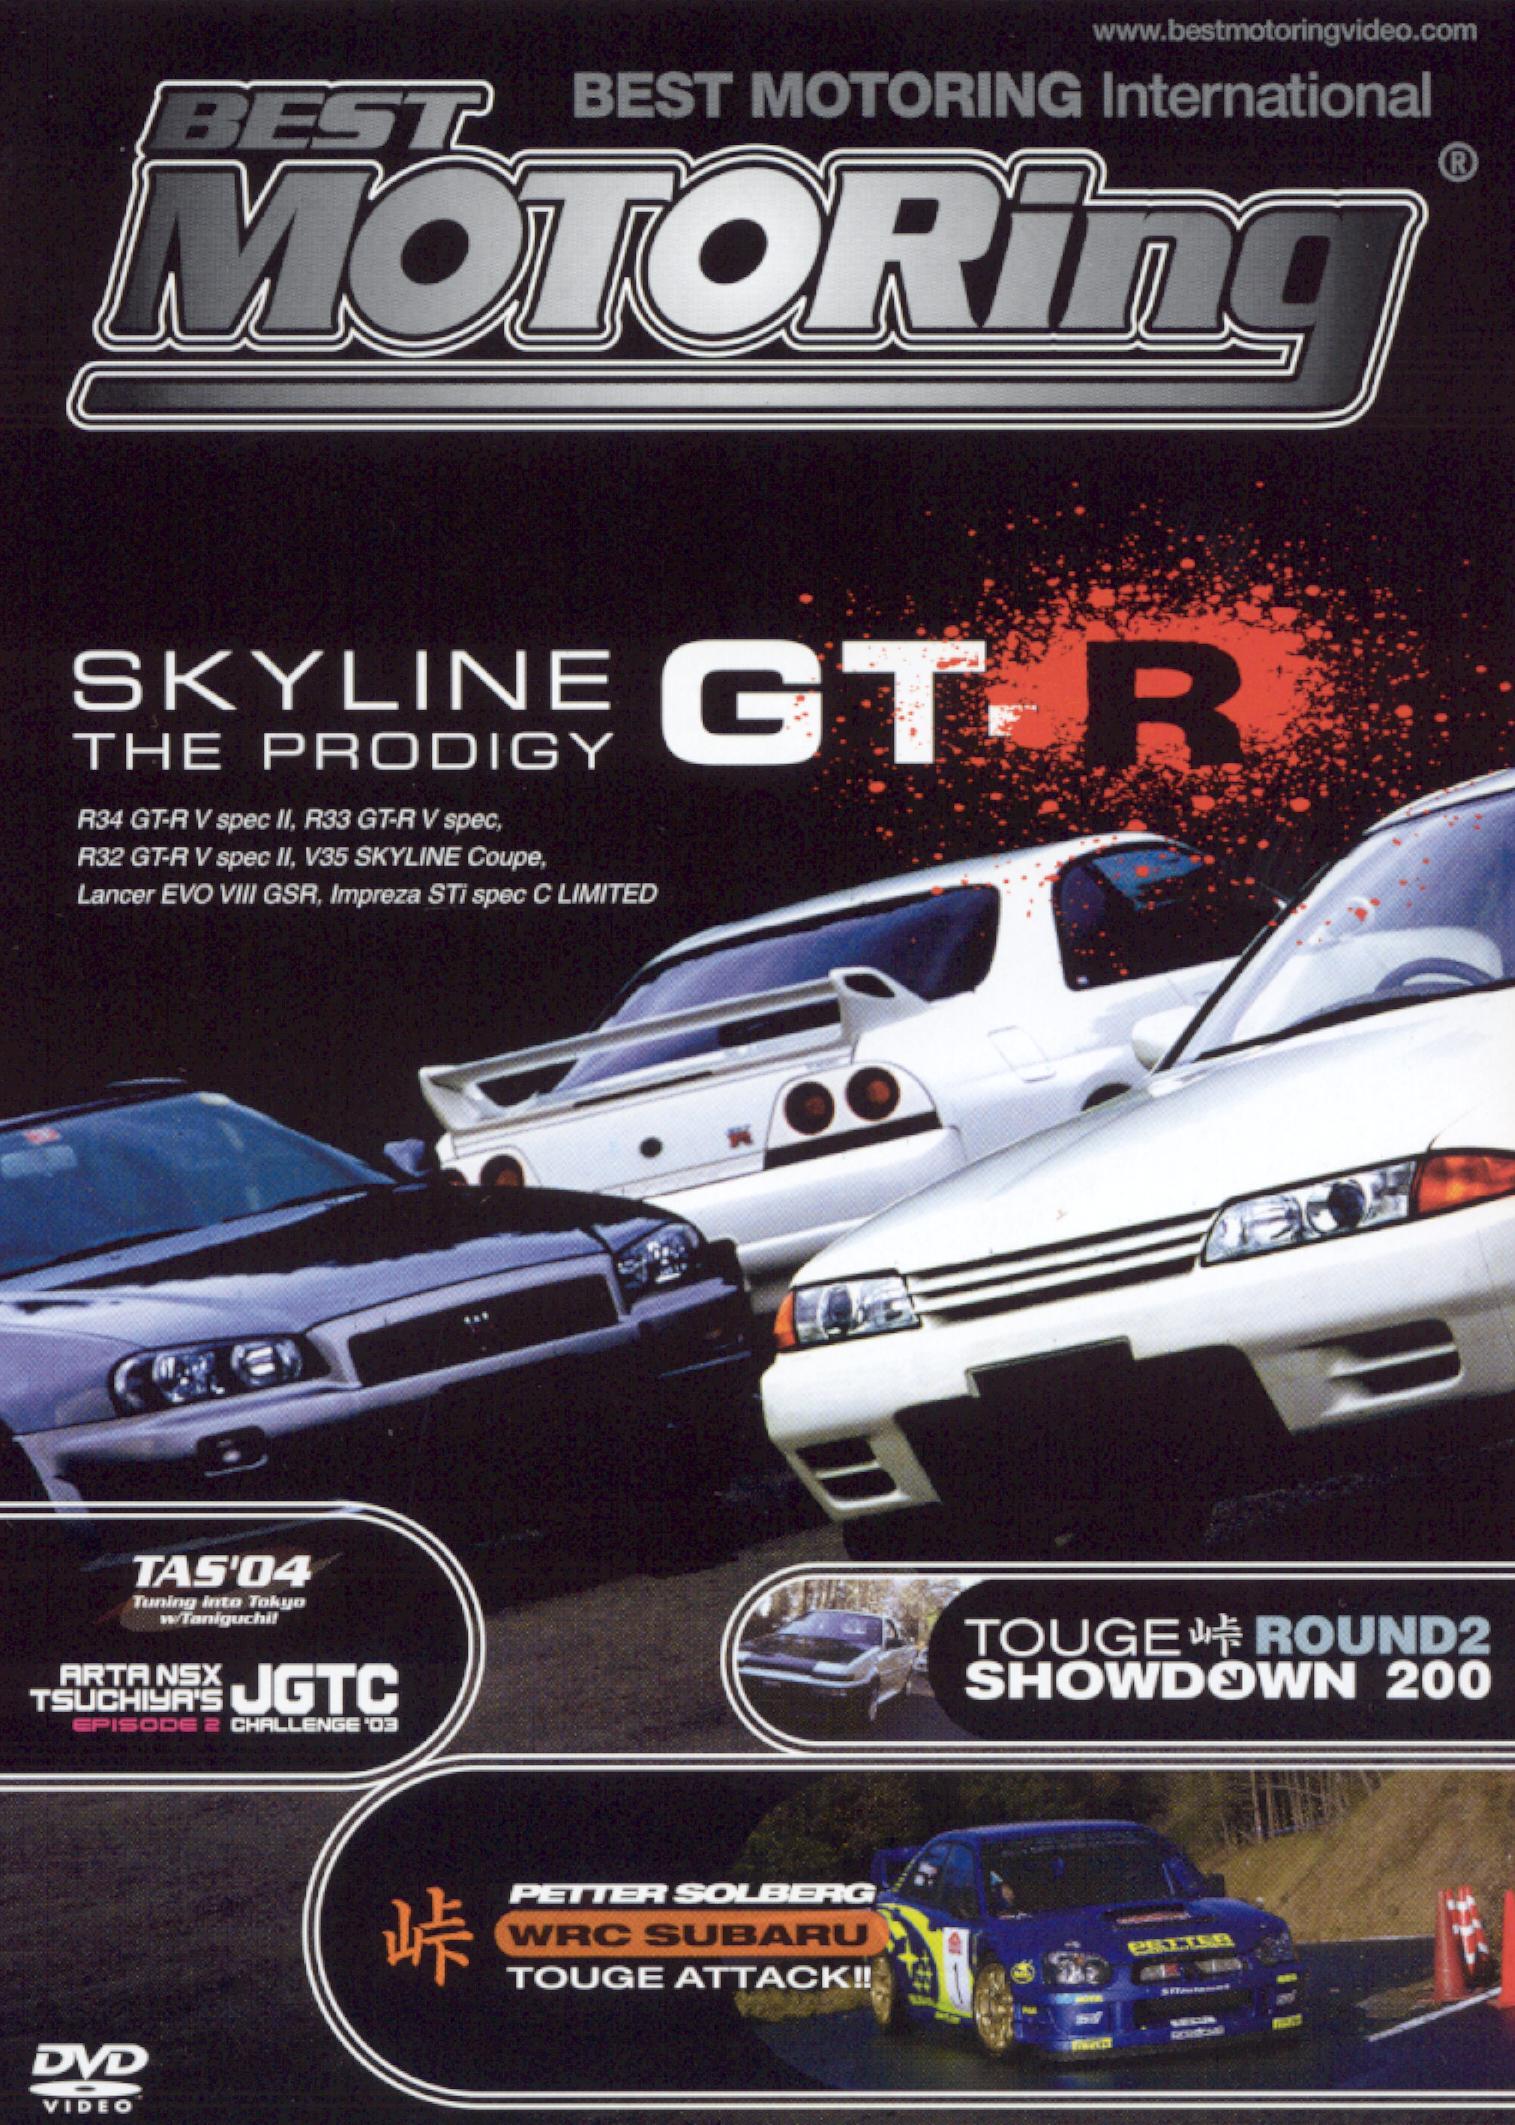 Best Motoring: Skyline GT-R - The Prodigy